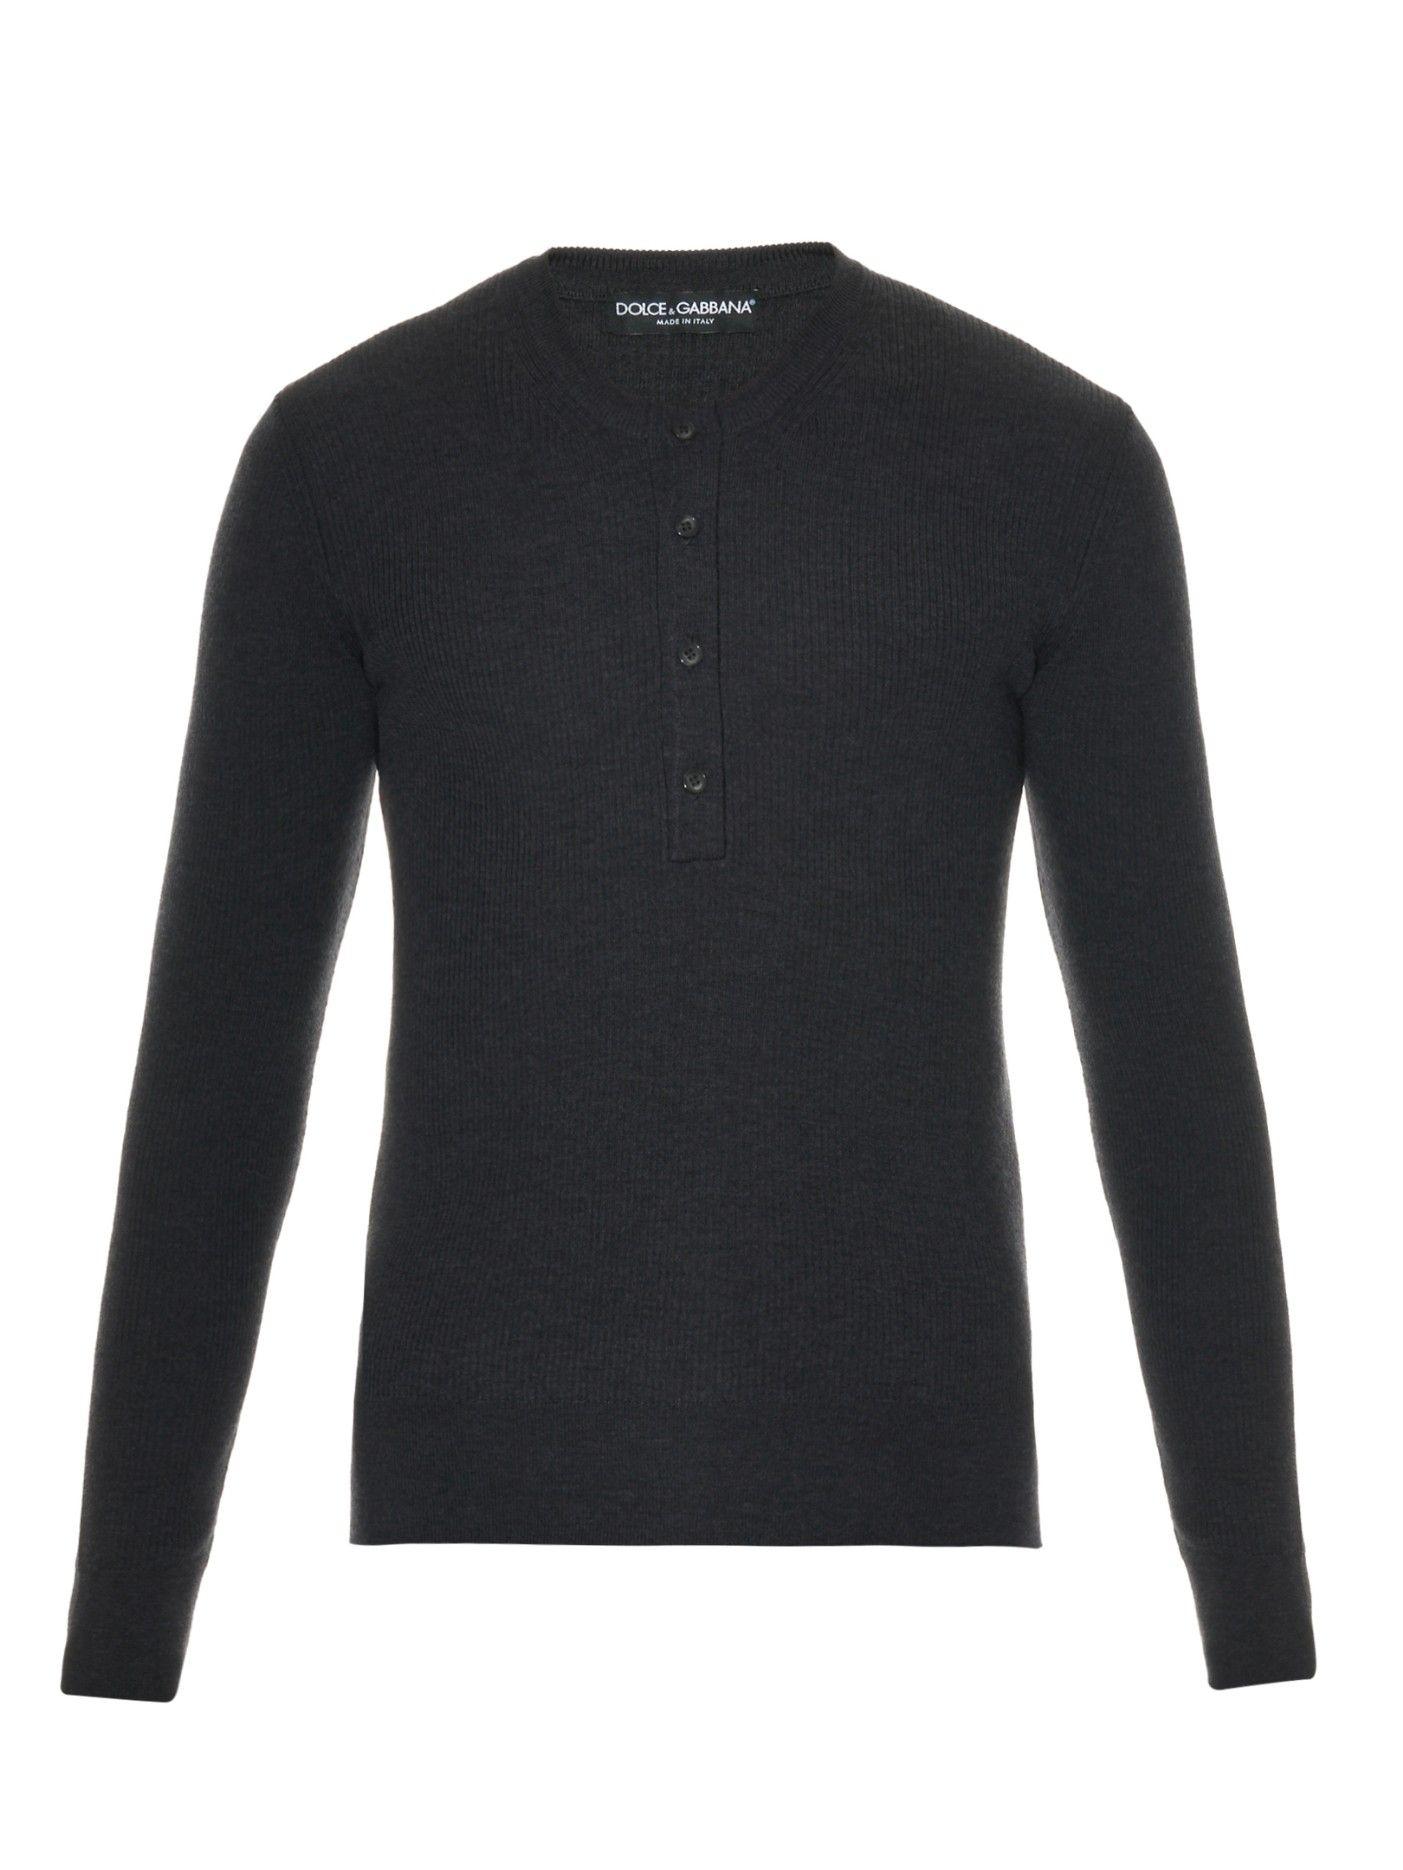 Ribbed-wool sweater | Dolce & Gabbana | MATCHESFASHION.COM US